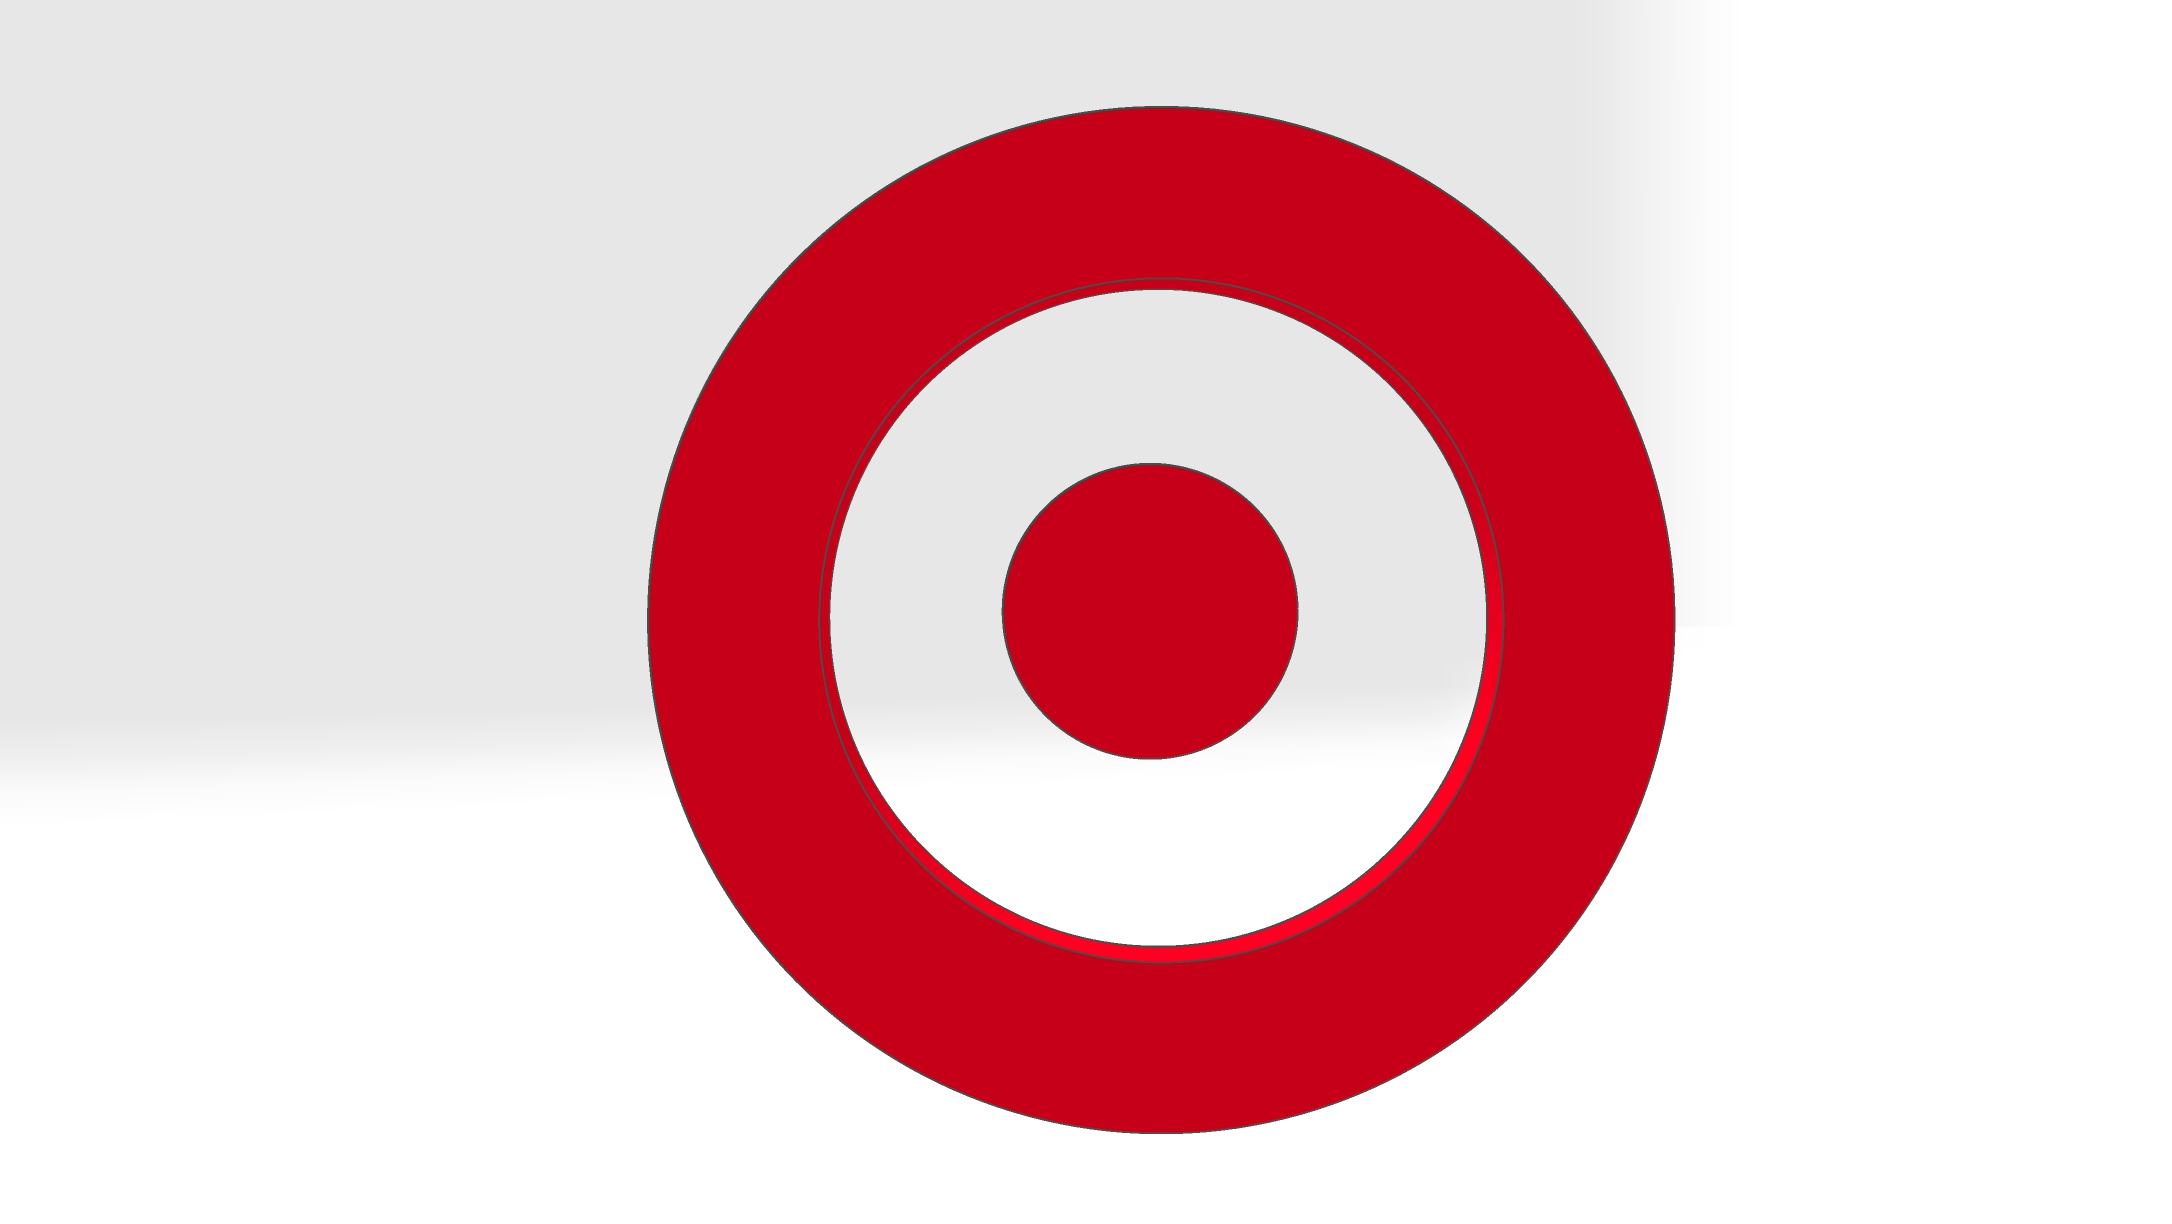 Target v16 - 1A.jpg